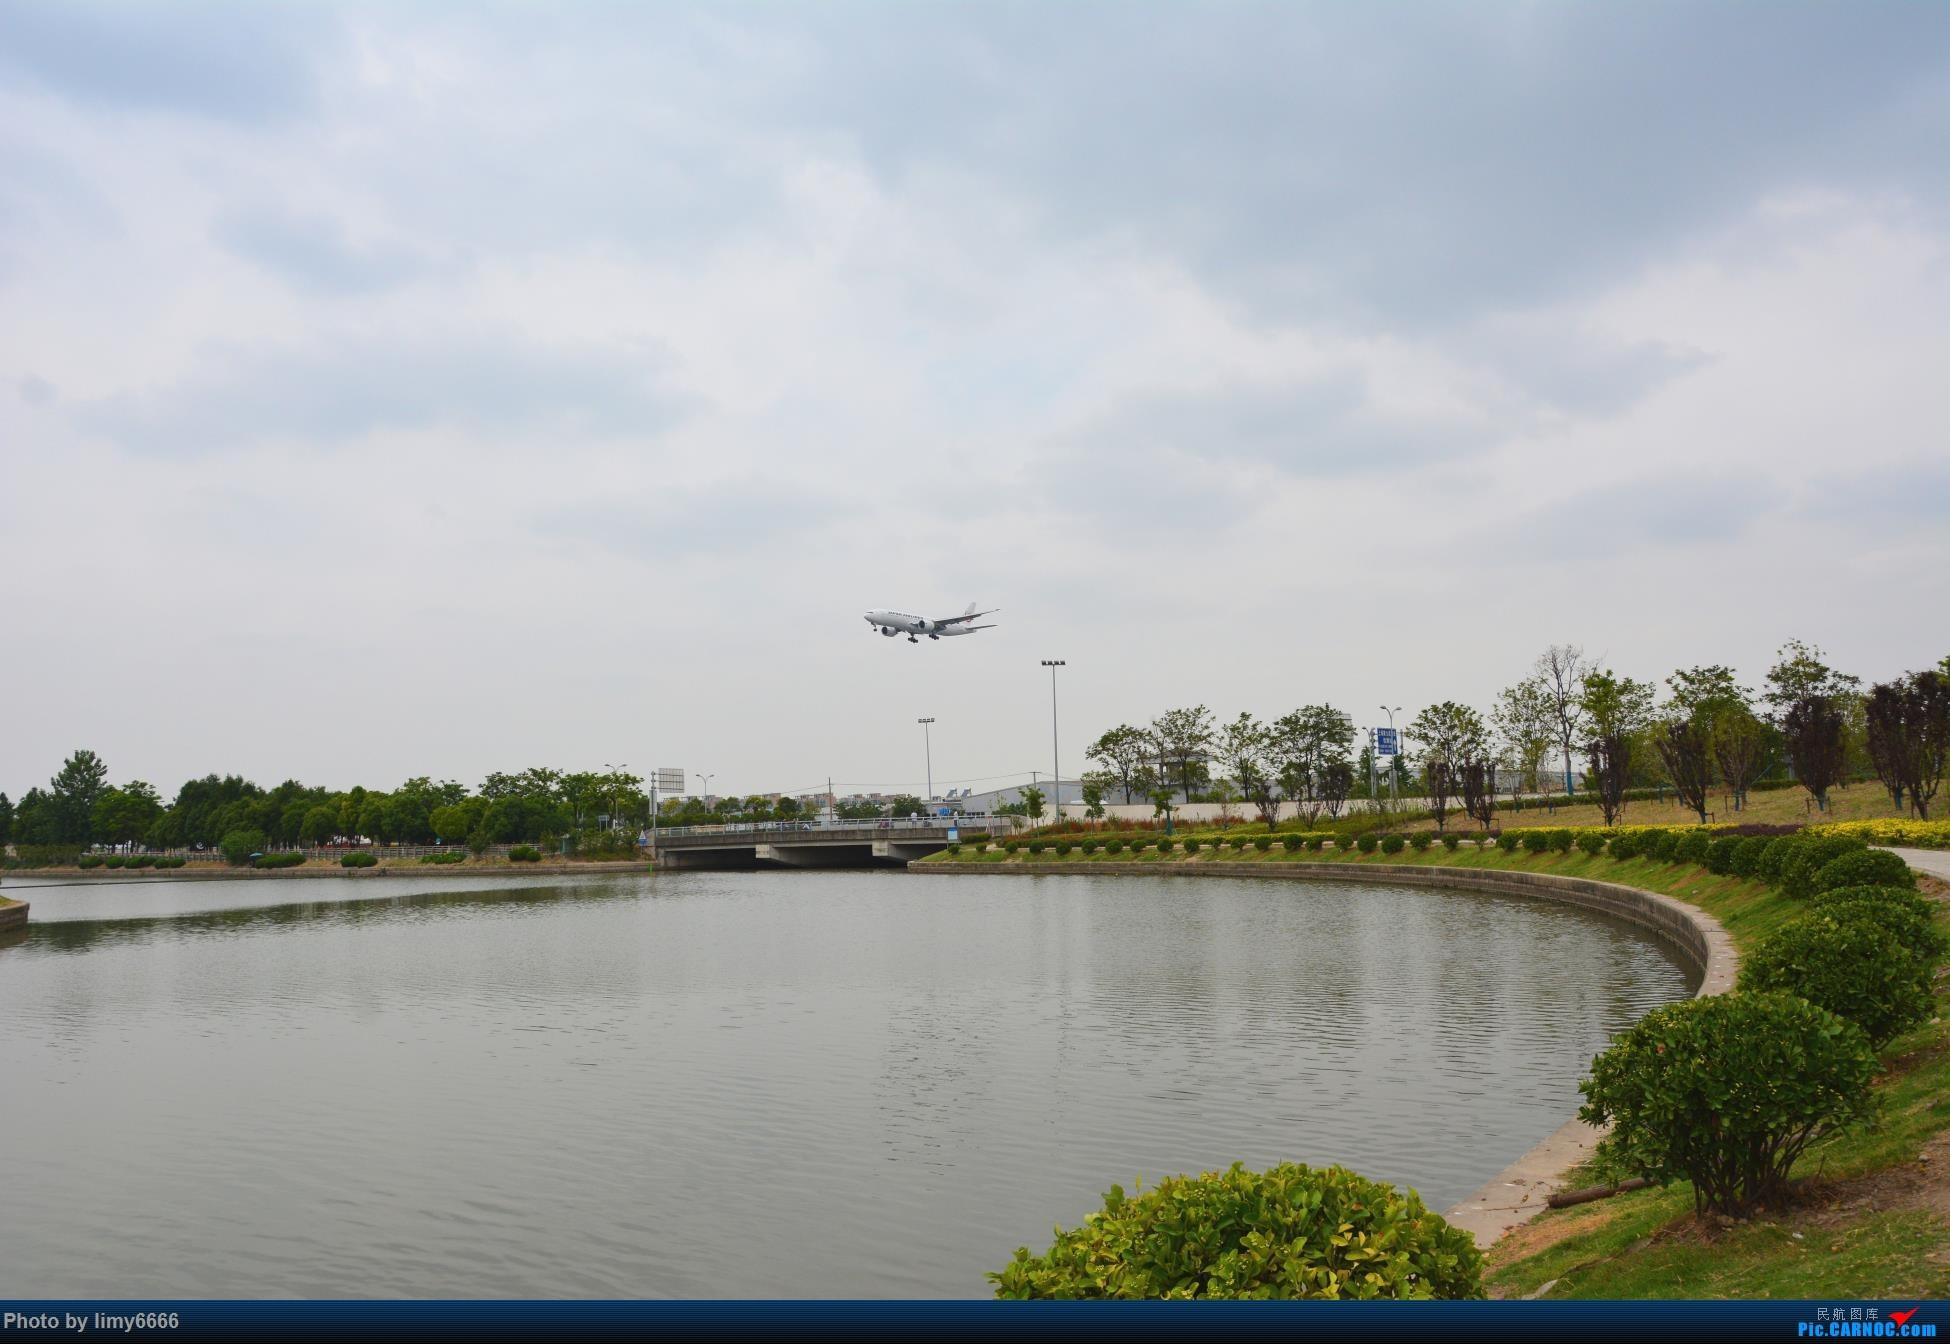 Re:[原创]上海虹桥机场拍机(在贵阳很少见或看不见的) AIRBUS A321-200 B-MAP 中国上海虹桥国际机场 中国上海虹桥国际机场